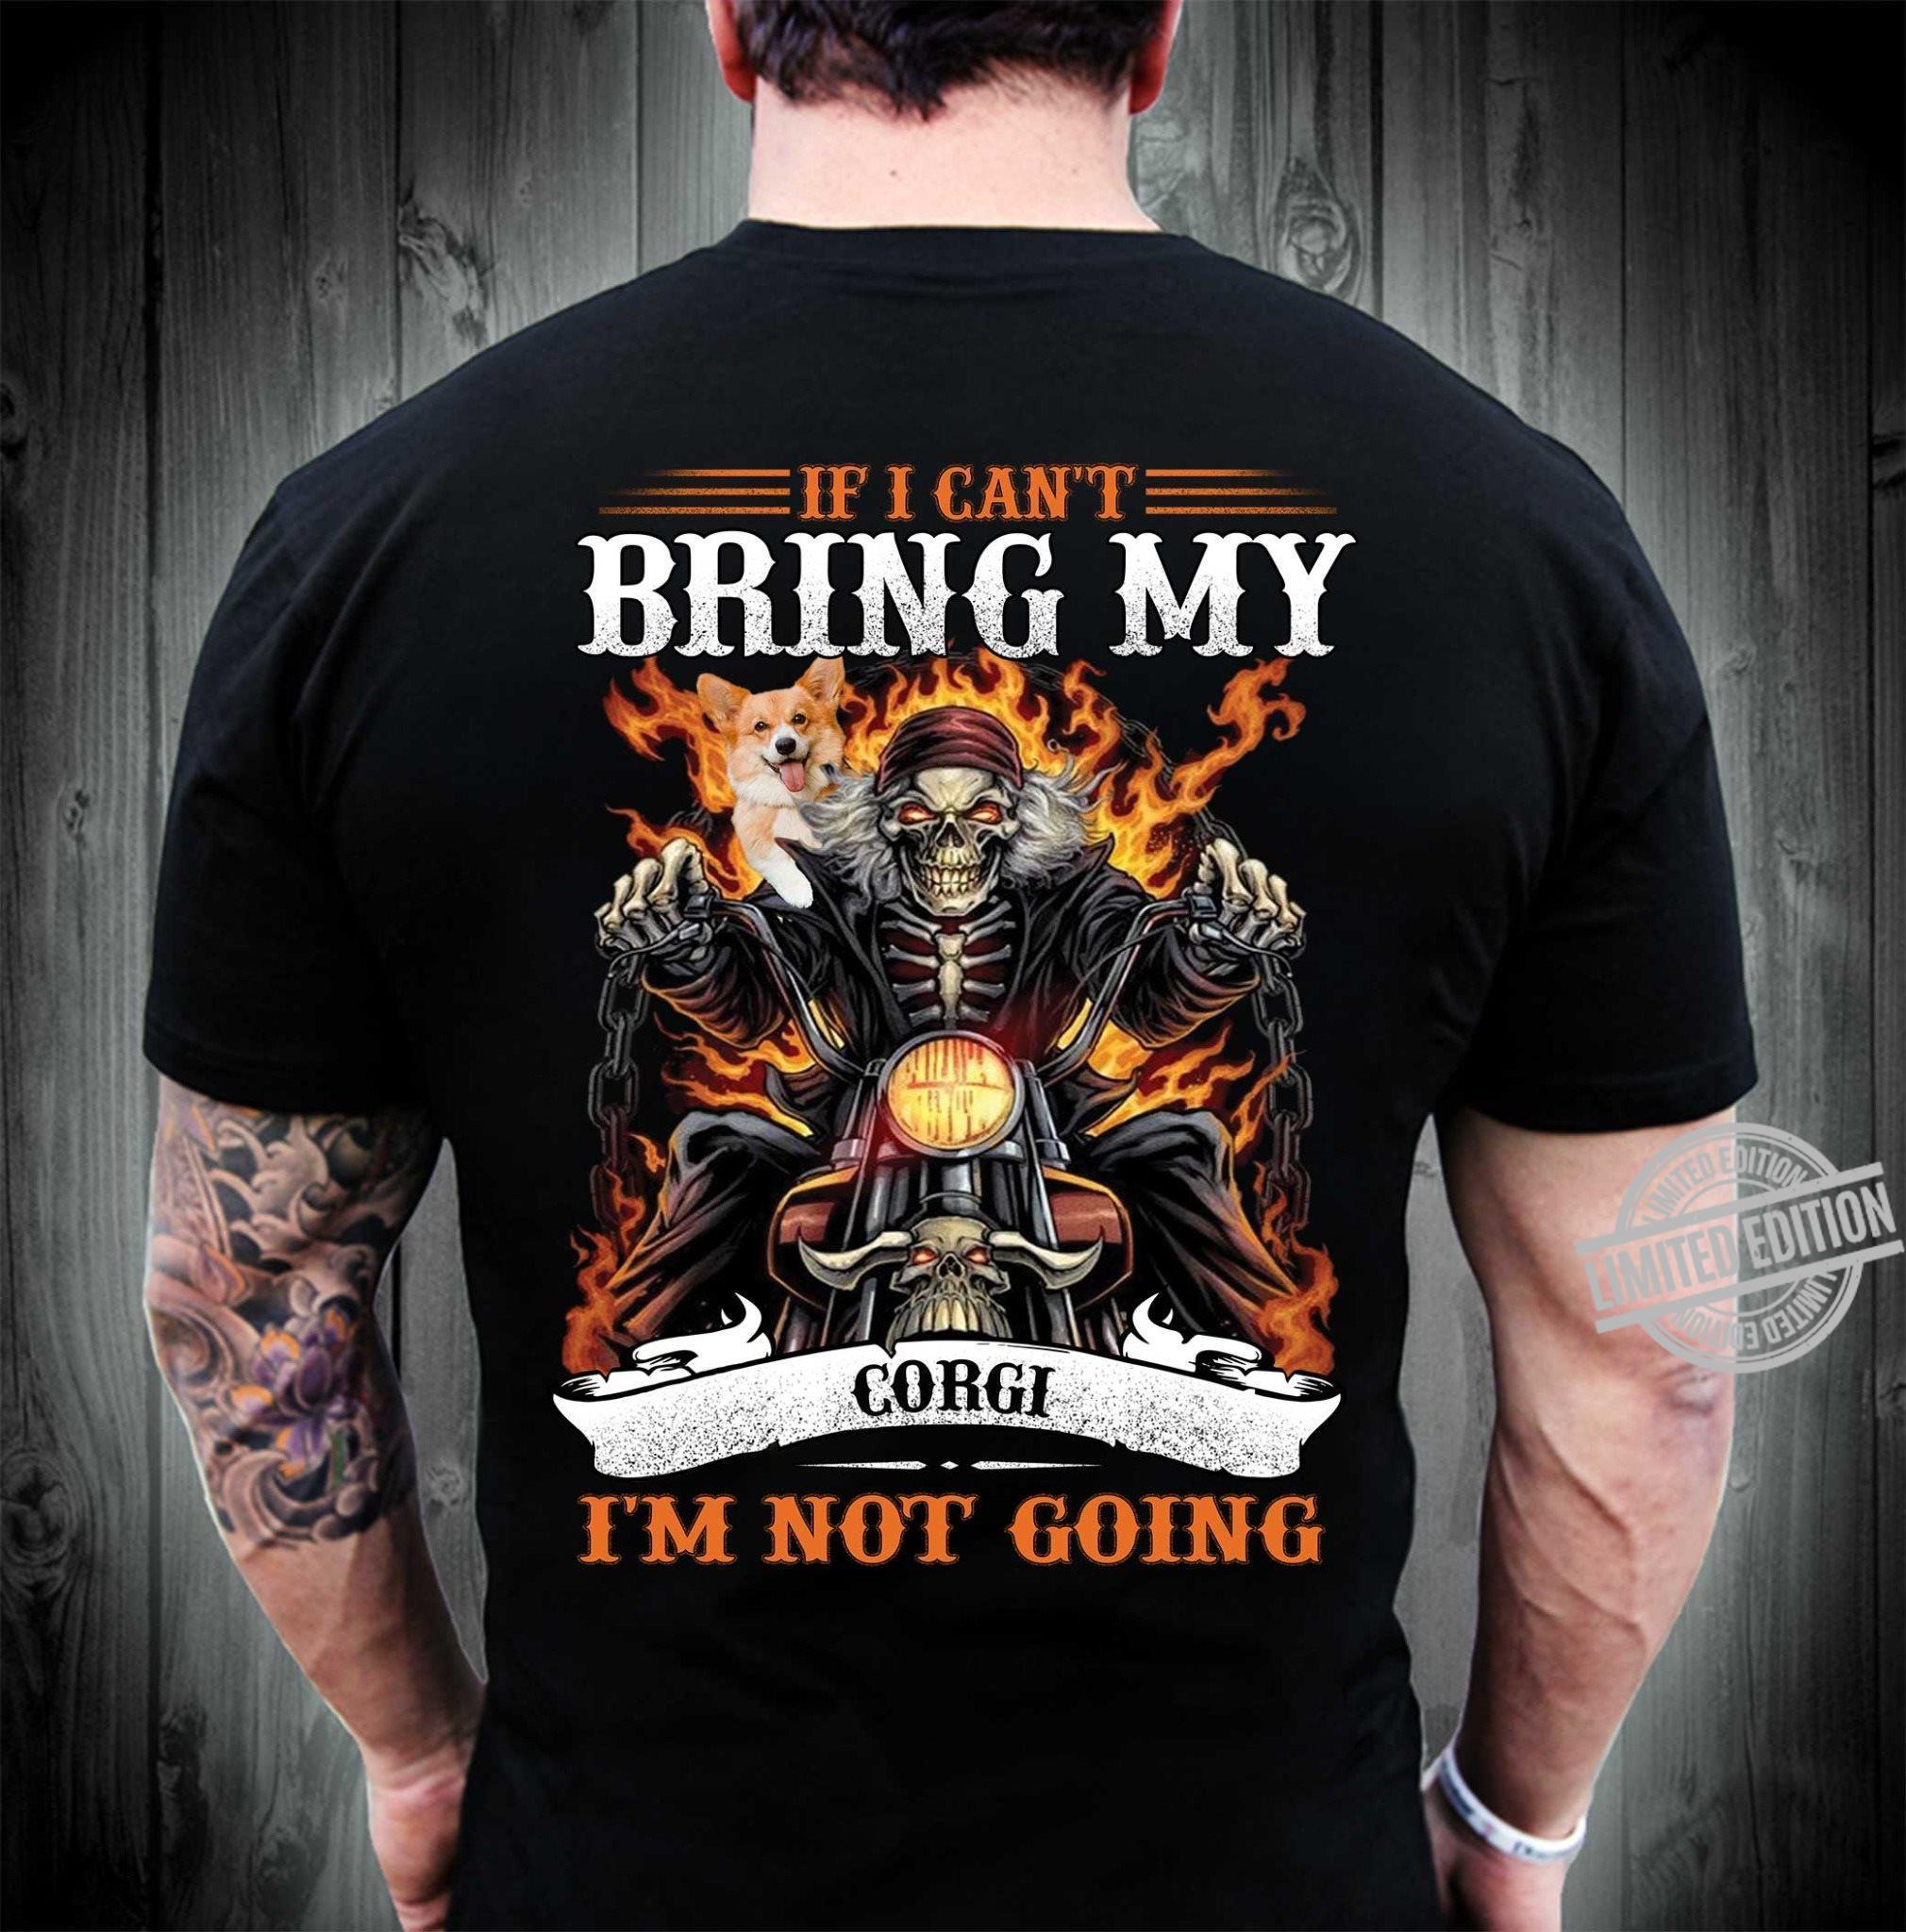 If I Can't Bring My Gorgi I'm Not Going Shirt